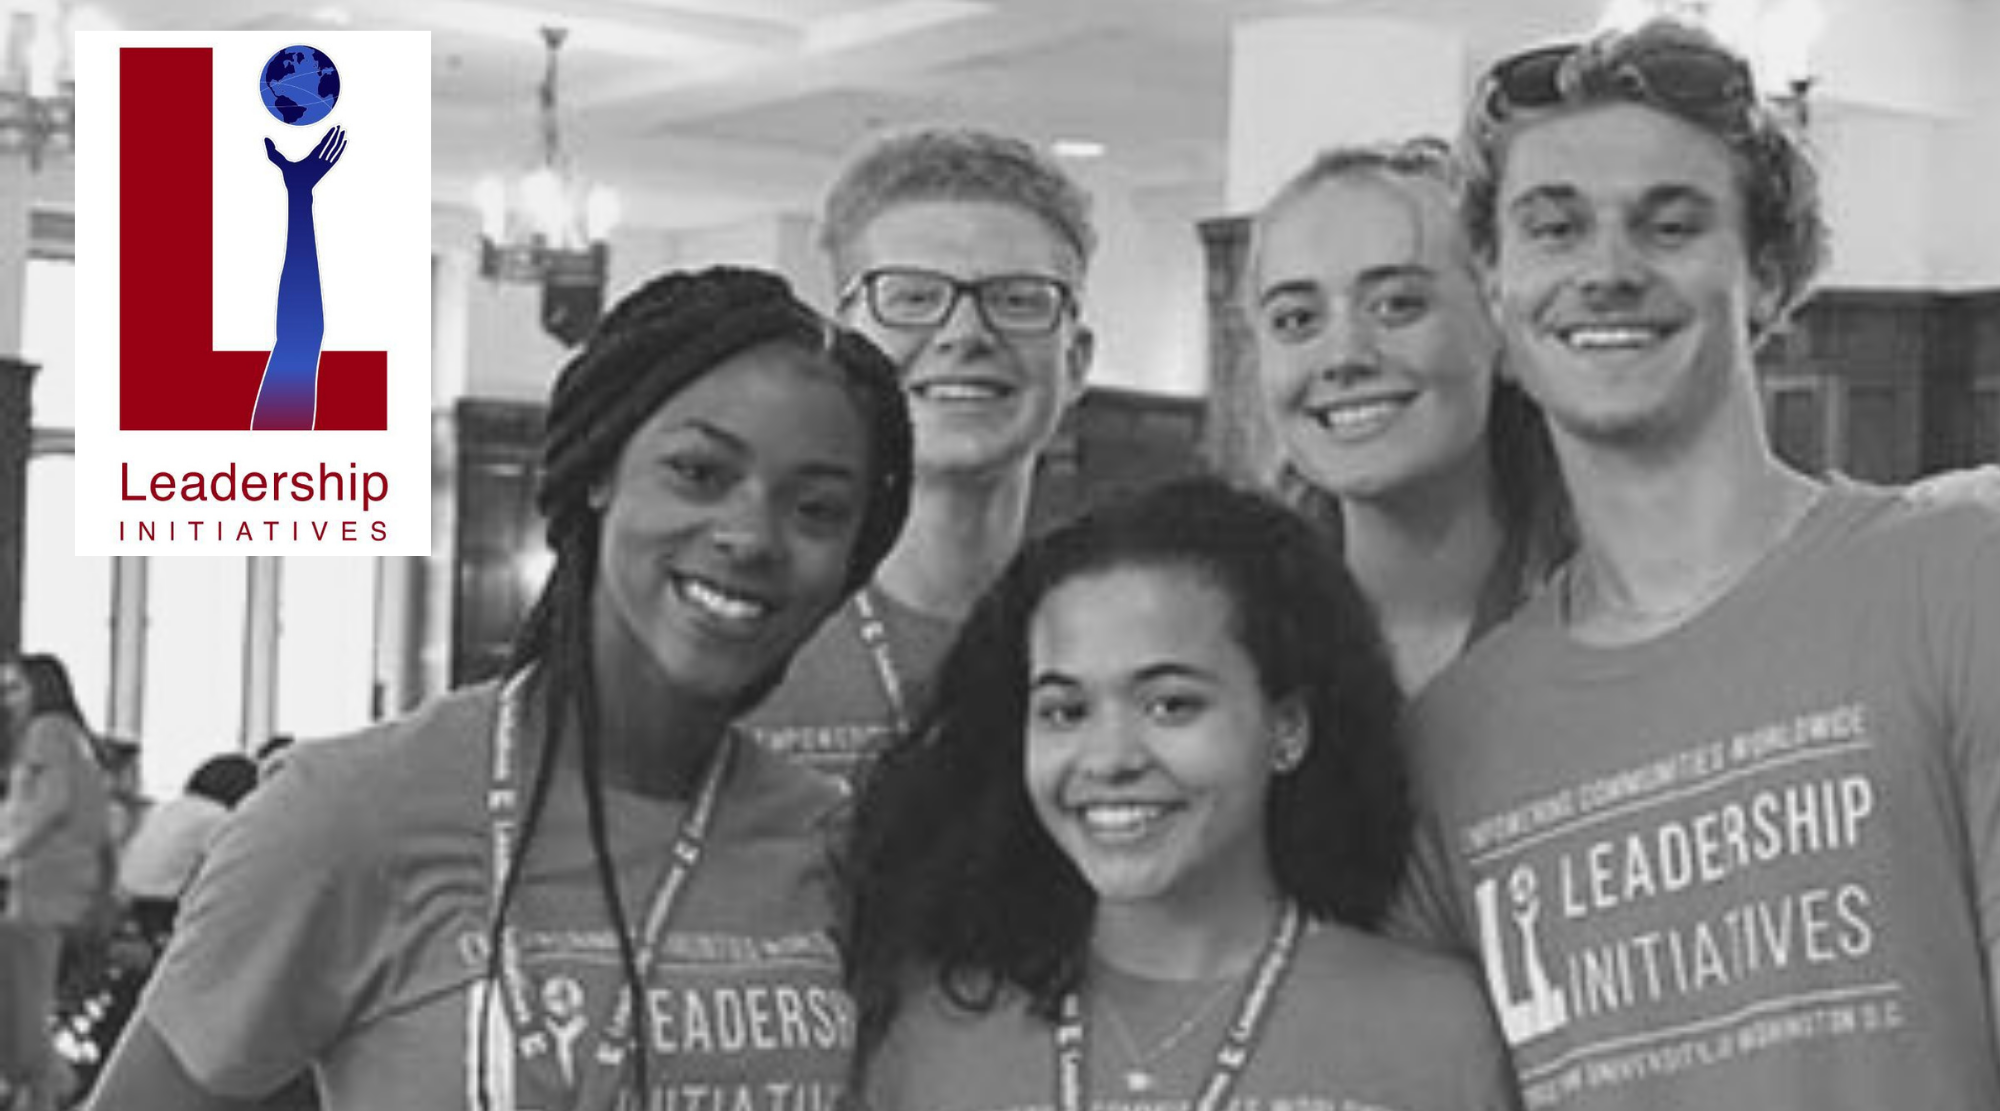 Leadership Initiatives and HOSA Partnership